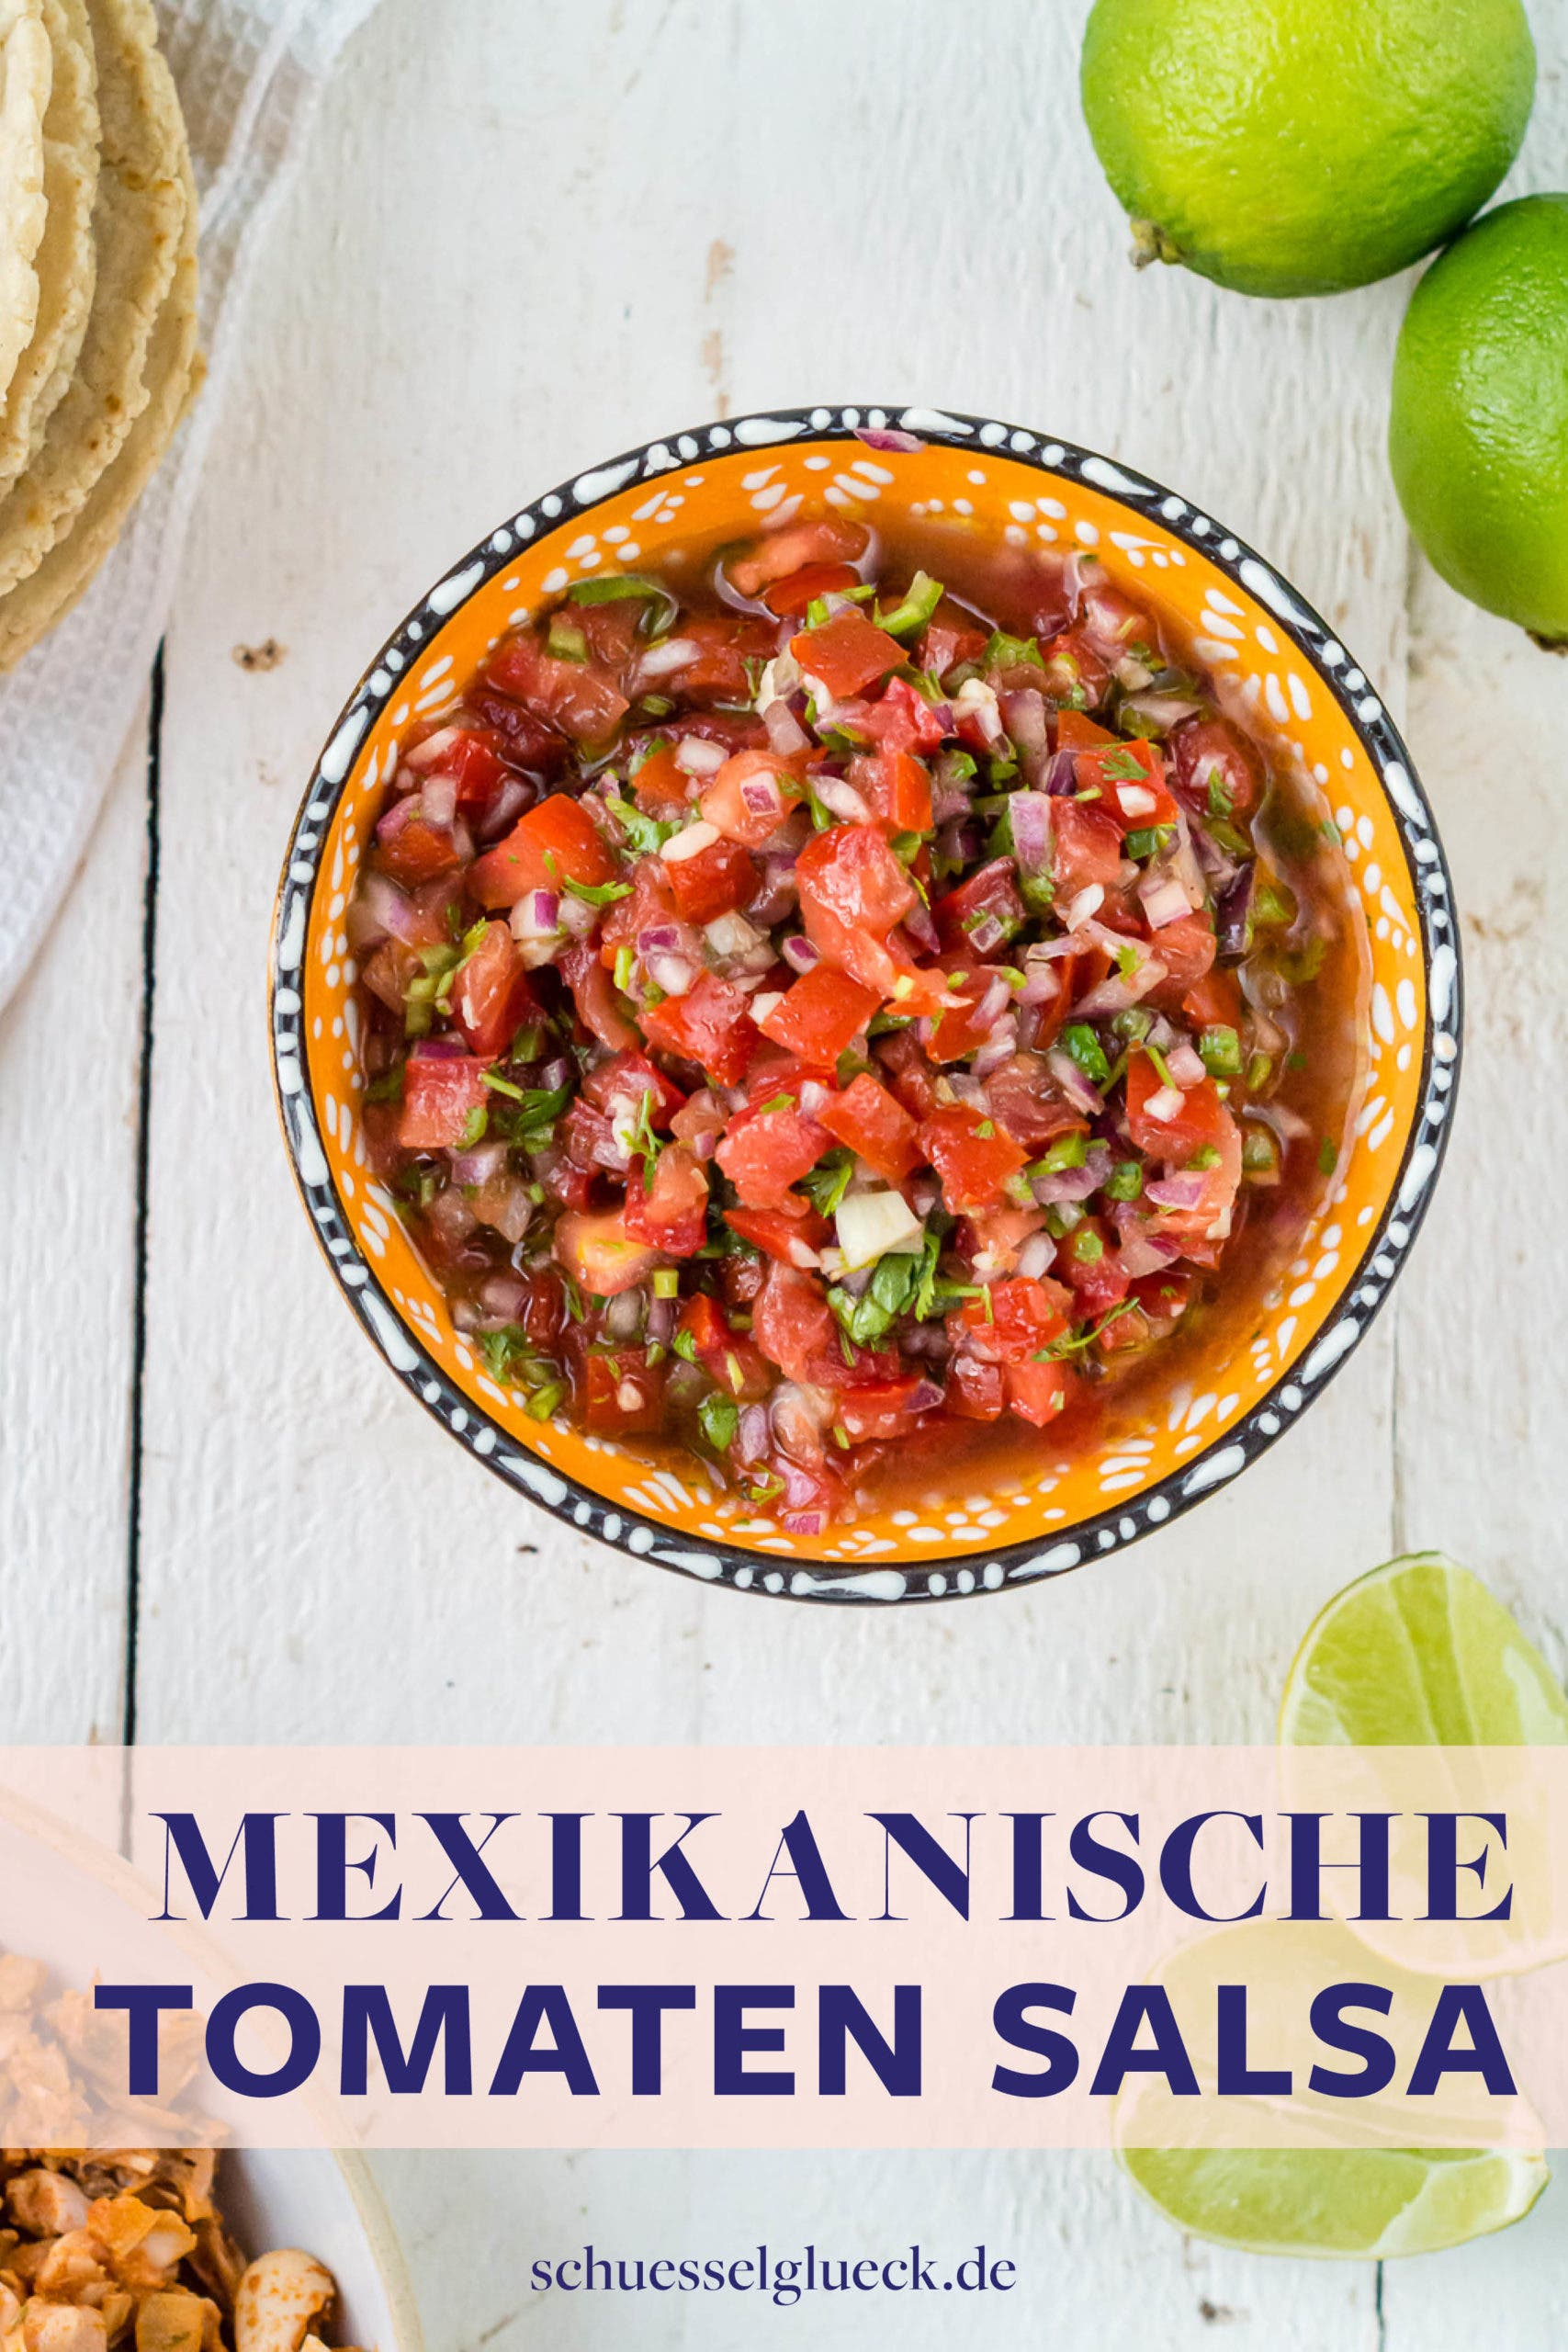 Pico de Gallo – klassisch mexikanische Tomaten Salsa